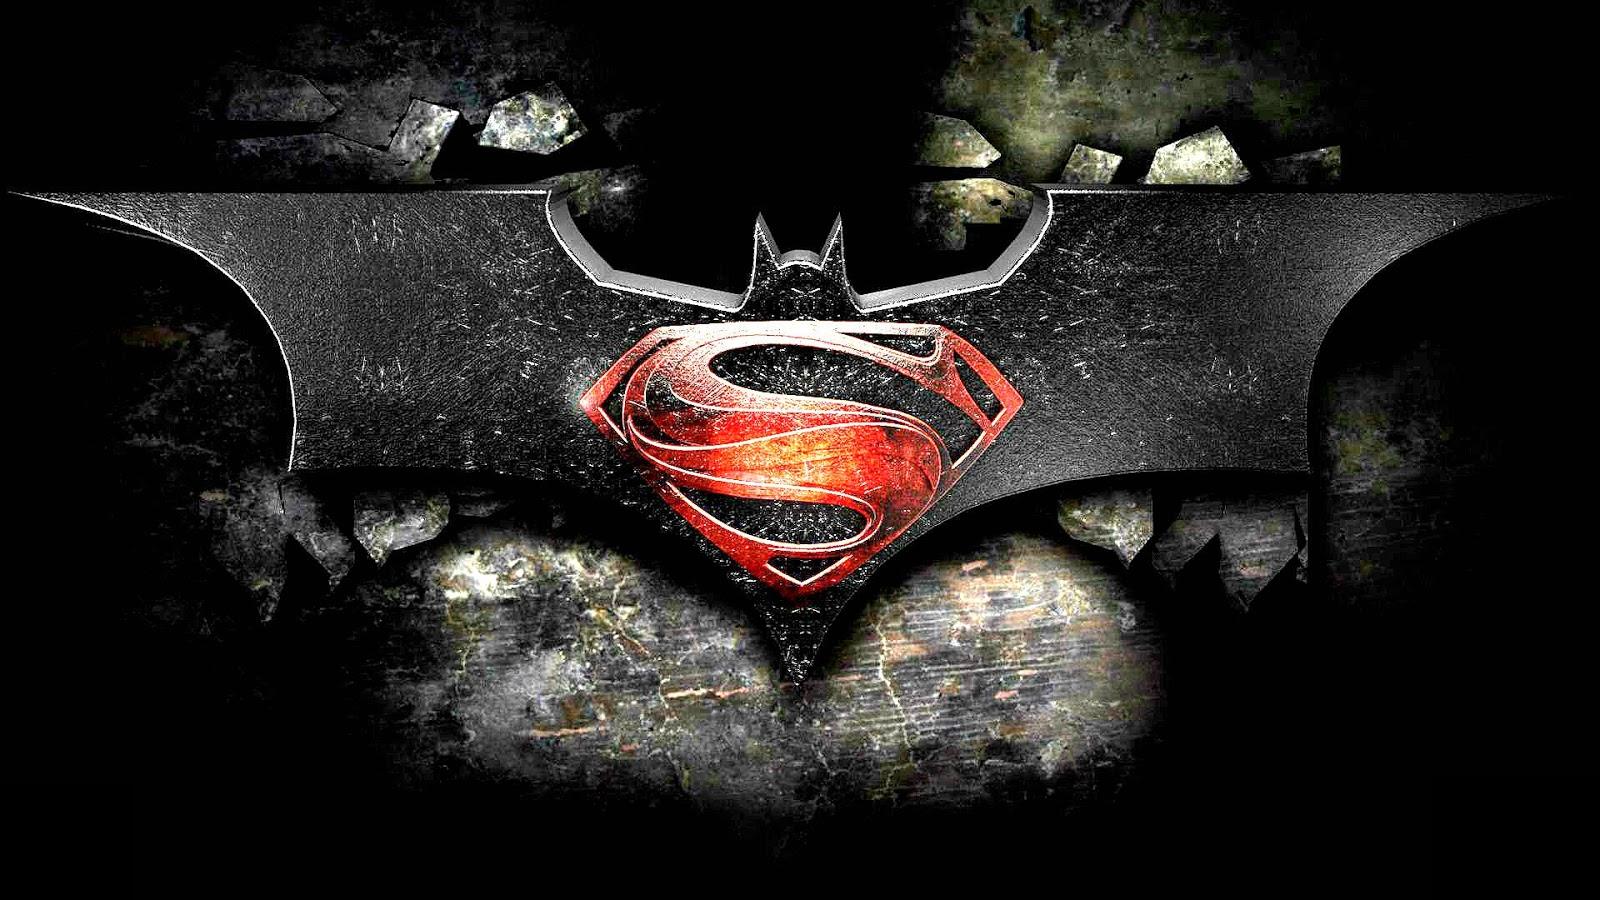 Free Download Superman Vs Batman Hd Wallpapers 1080p Hd Wallpapers Of Movie Batman 1600x900 For Your Desktop Mobile Tablet Explore 49 Batman Hd Wallpapers 1080p Batman Logo Wallpaper Hd